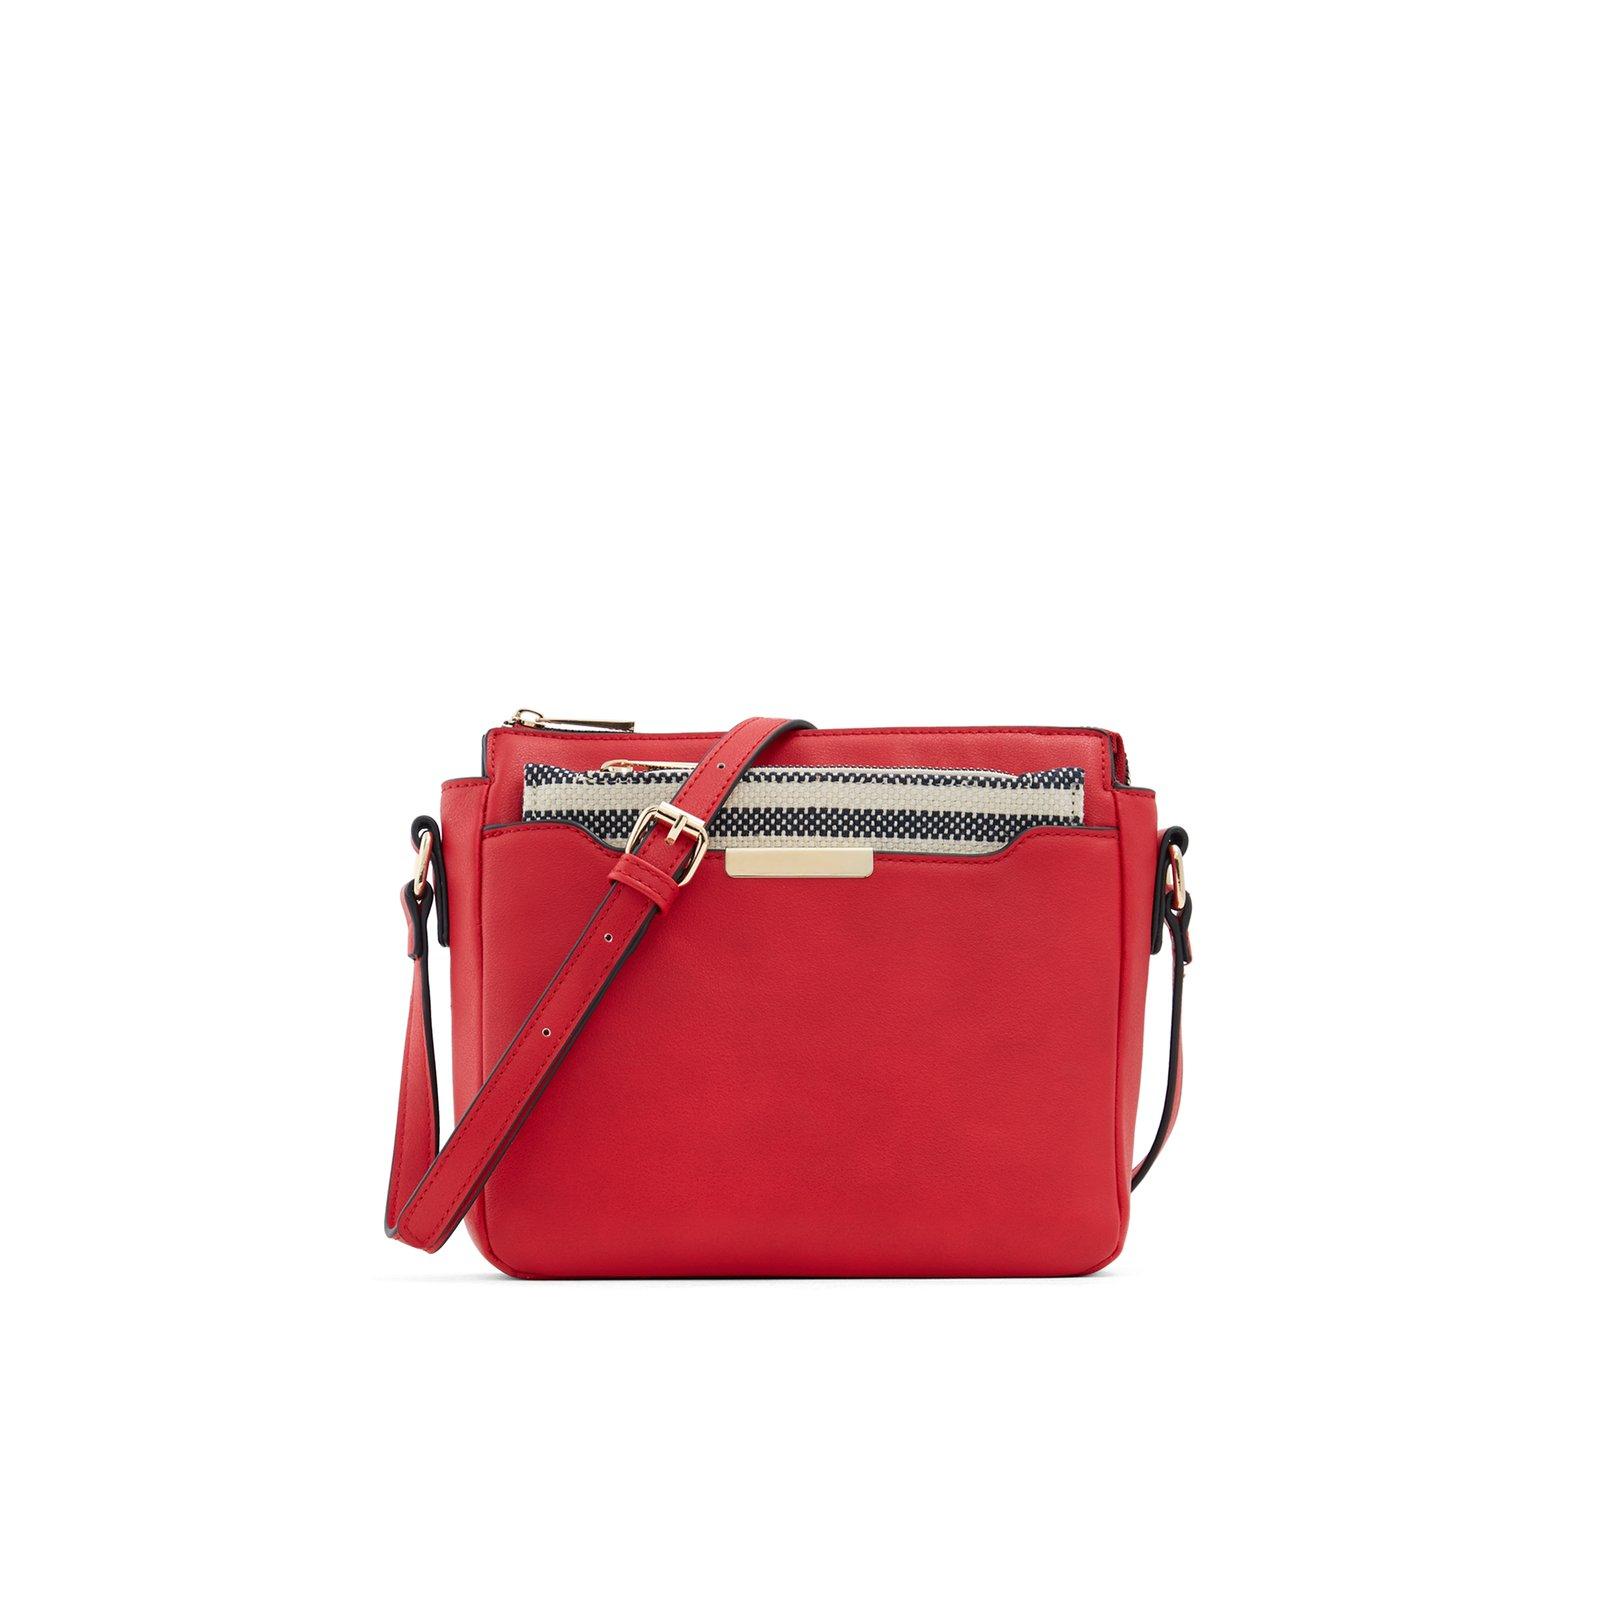 Luca Ferri Mirirella - Women's Handbags - Red photo